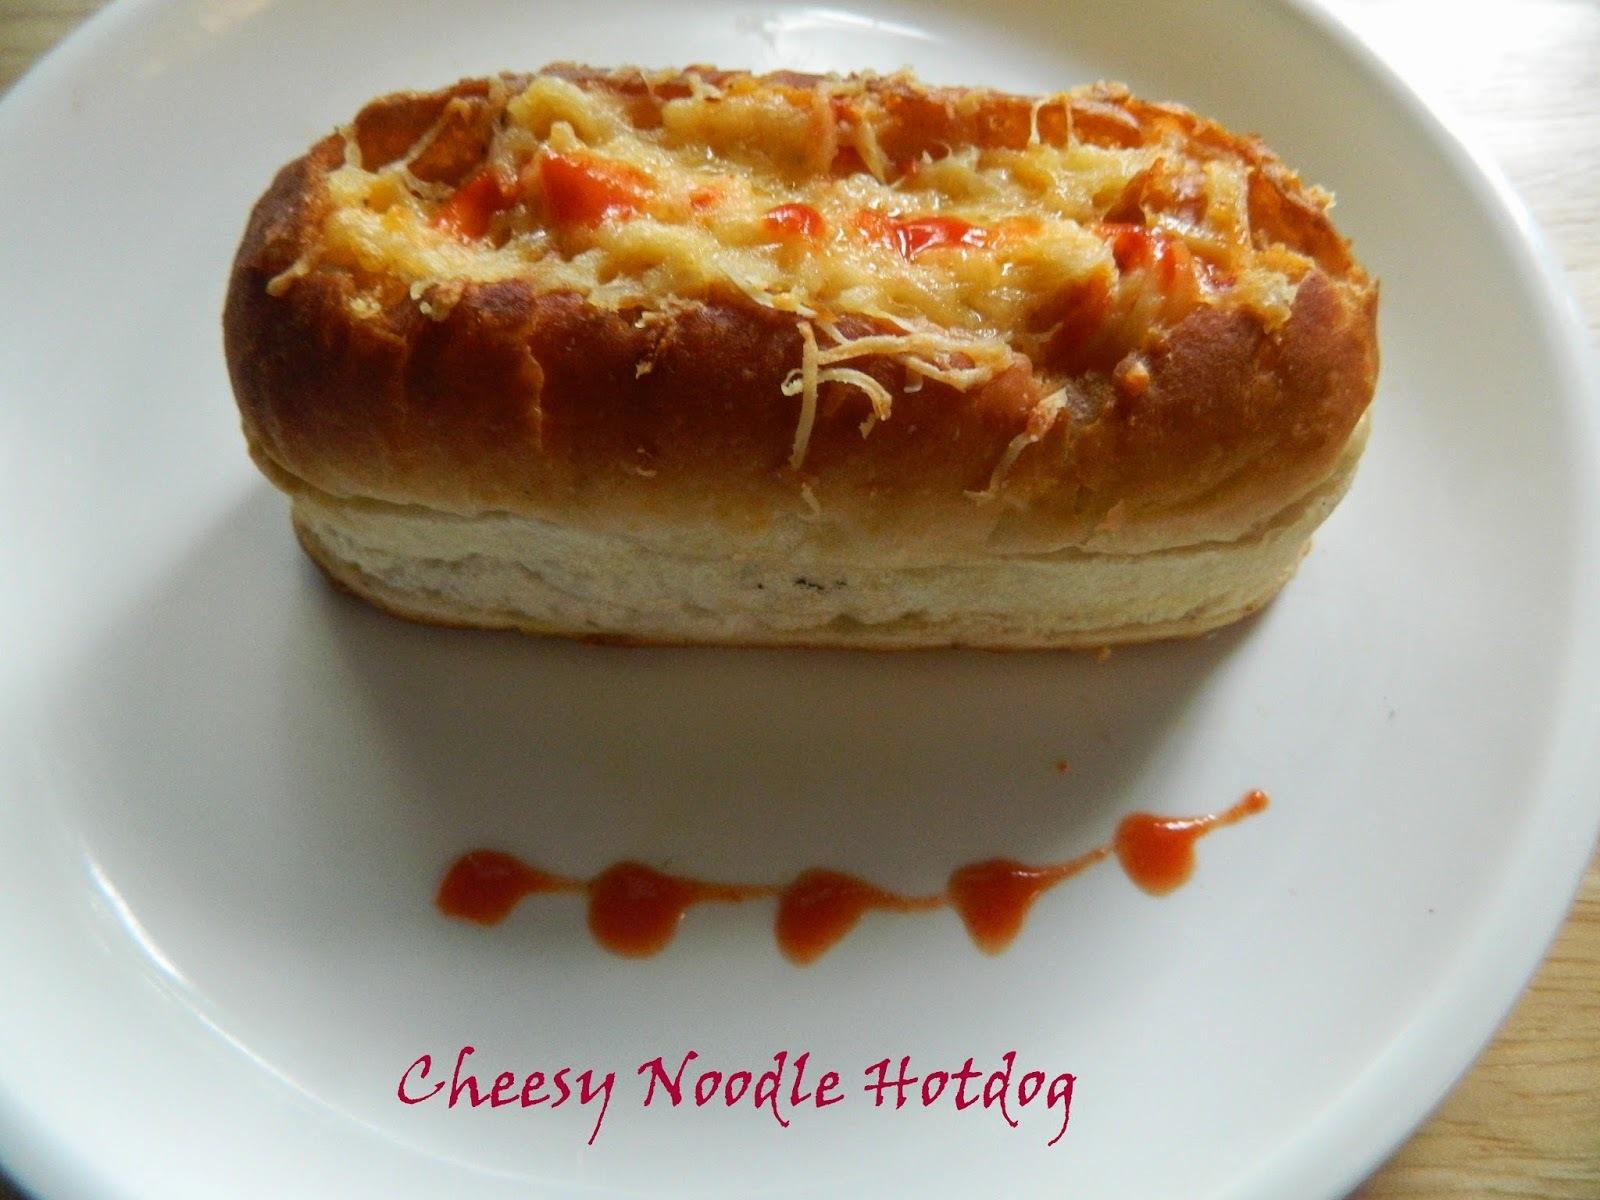 Cheesy Noodle stuffed Hotdog